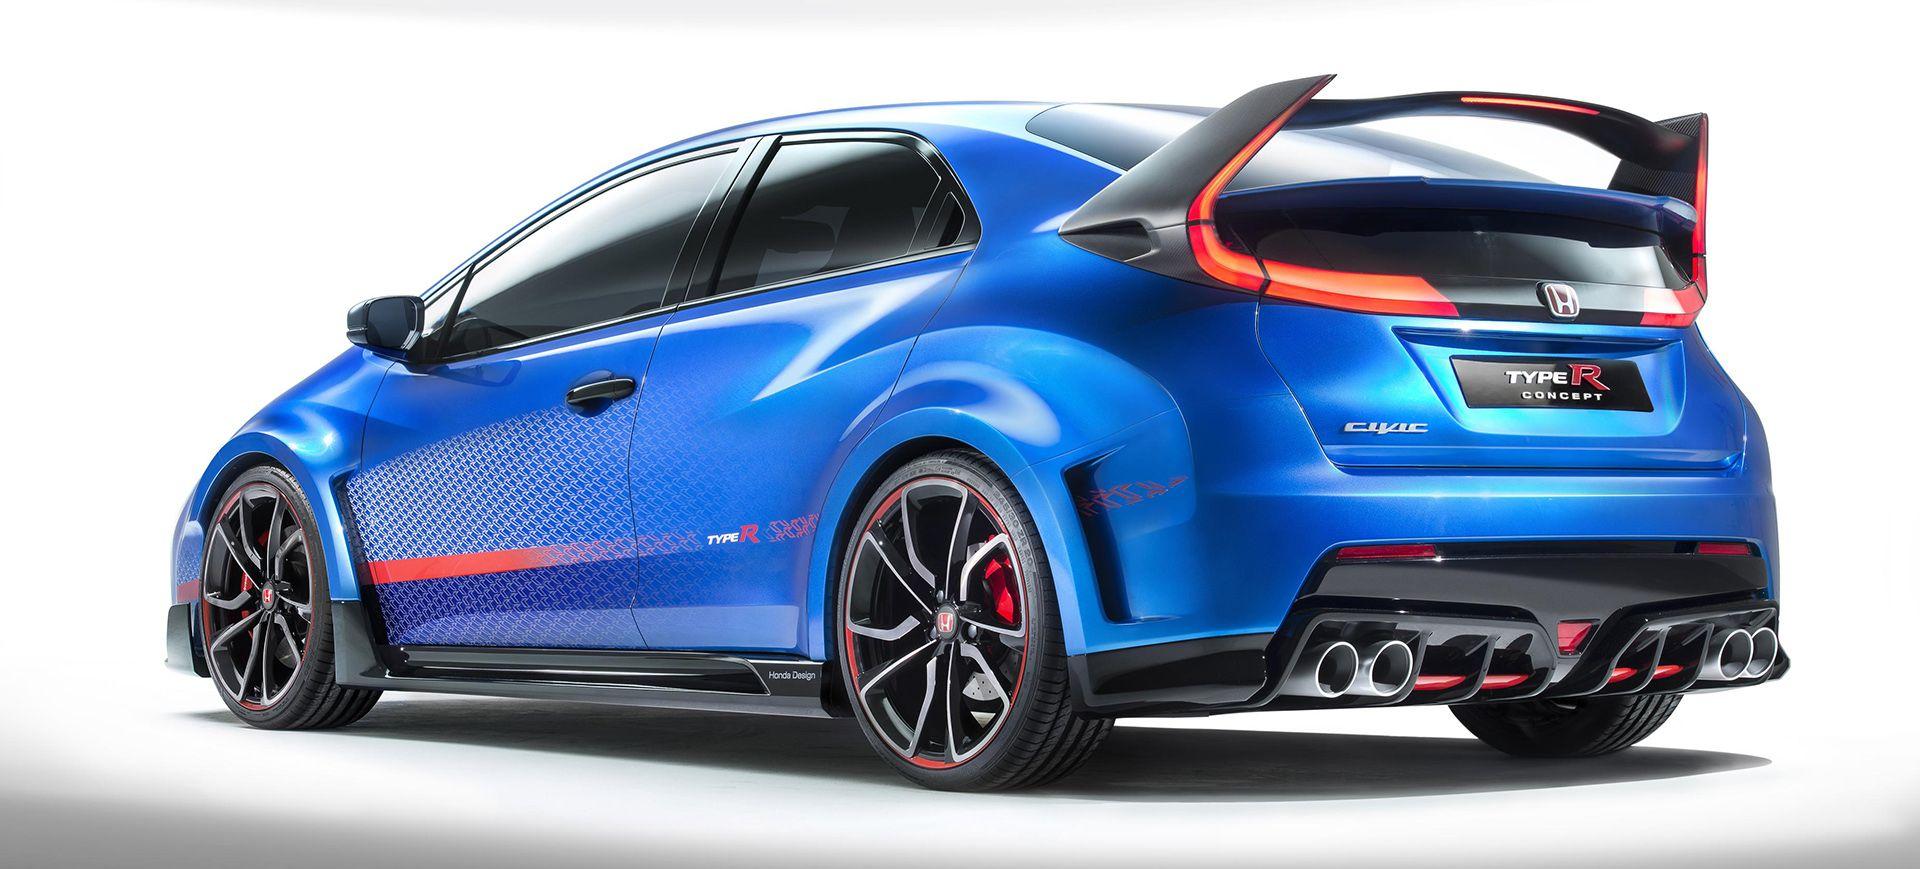 The 276 Hp Honda Civic Type R Will Be The Most Extreme Honda Ever Made Honda Civic Type R Honda Civic 2015 Honda Civic